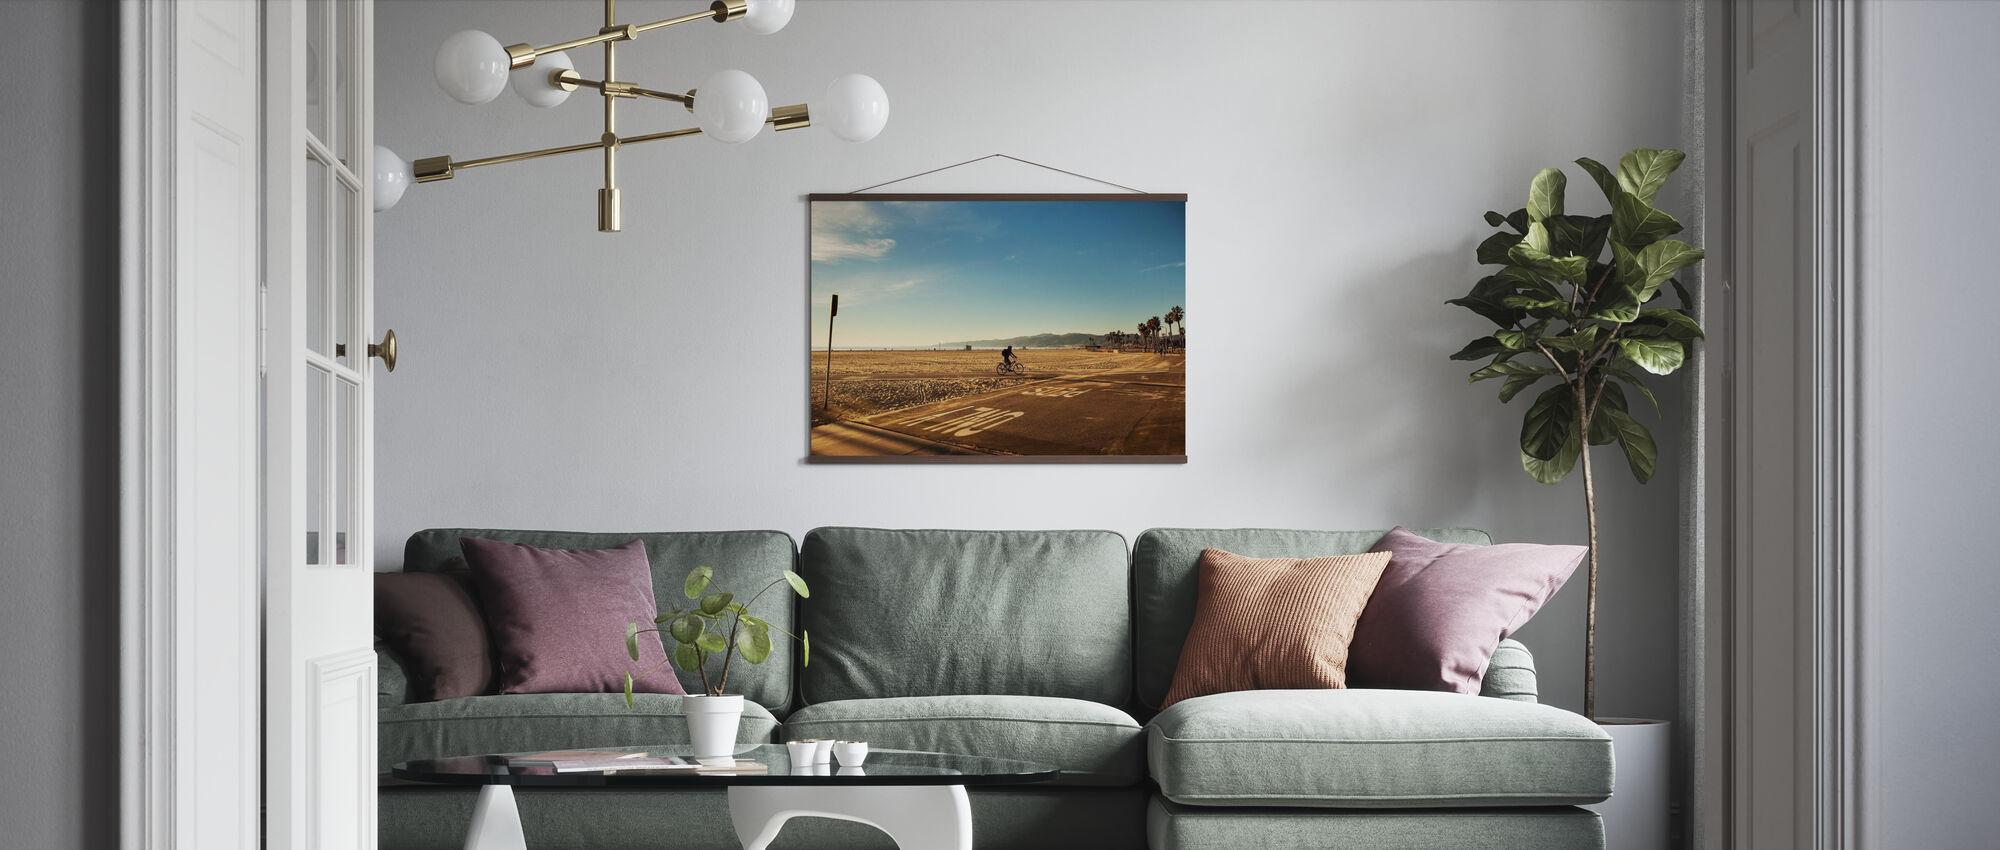 Venice Beach, Los Angeles - Plakat - Stue